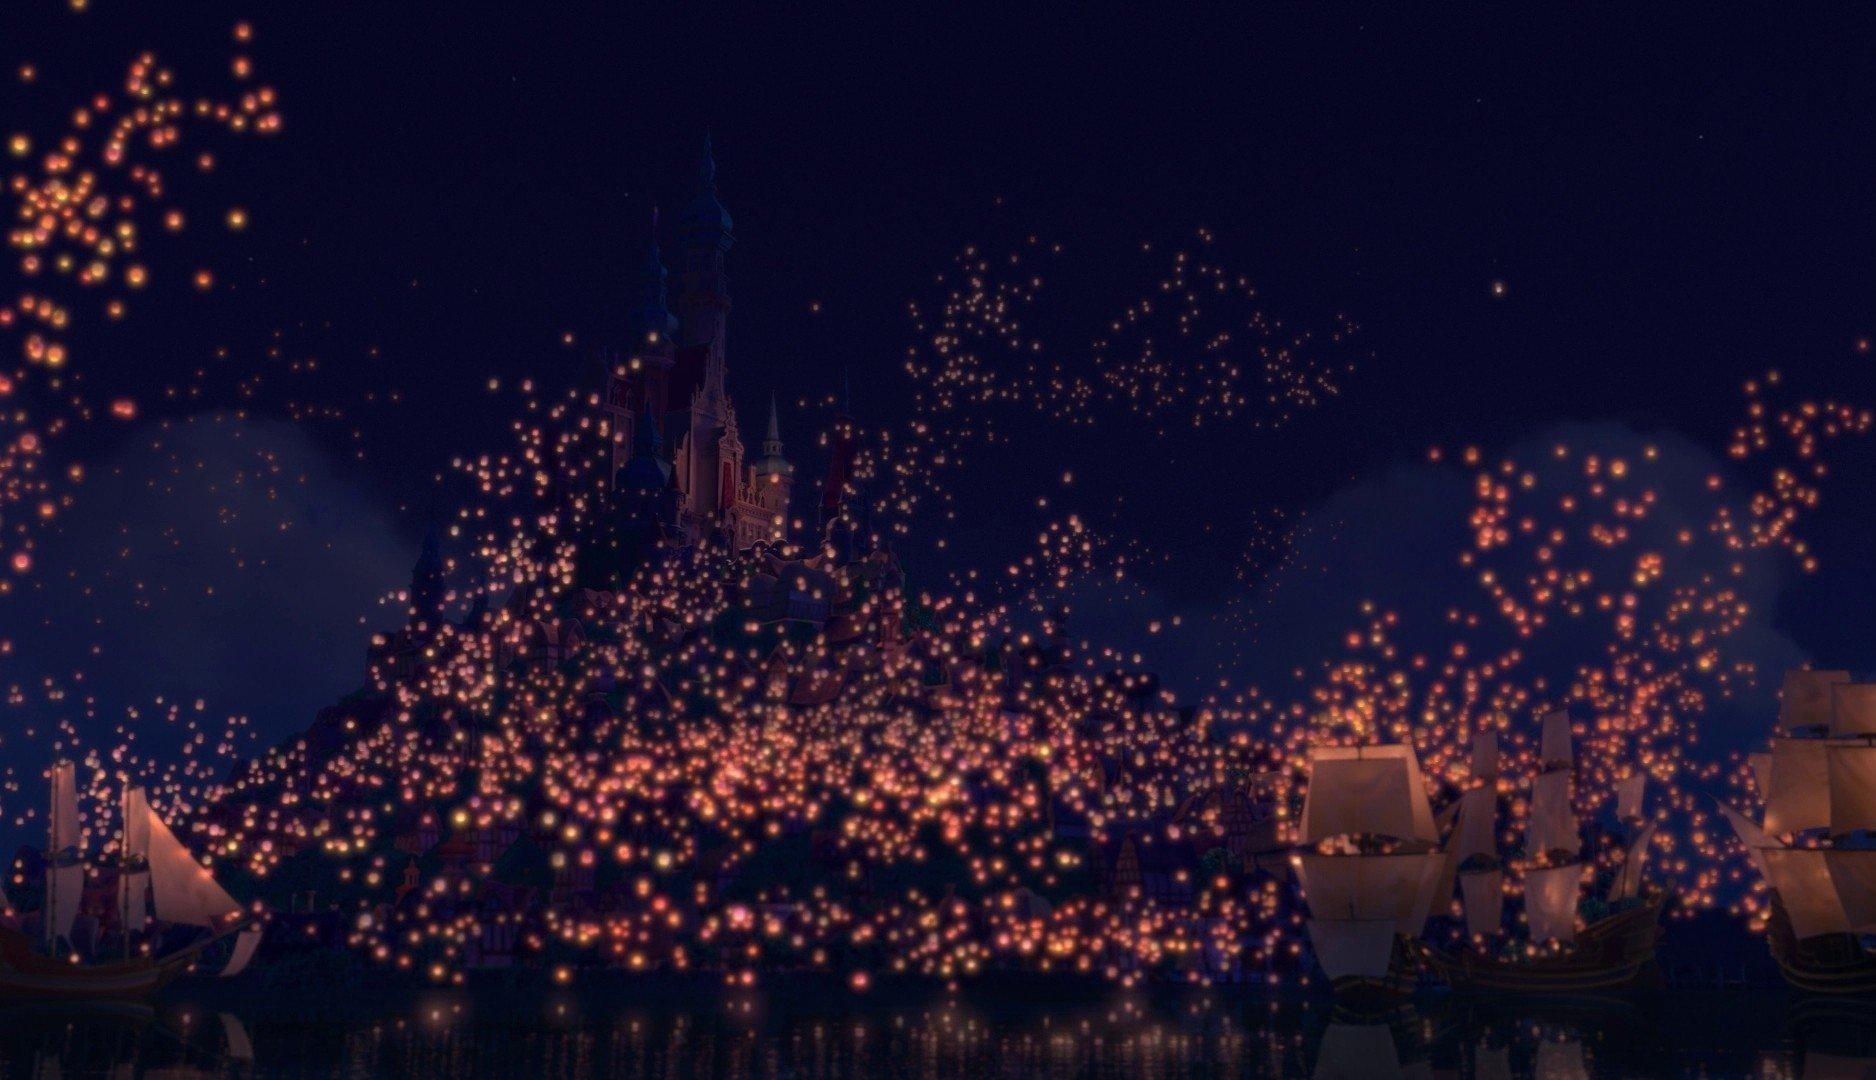 Disney company movies night lights lanterns tangled rapunzel wallpaper ...